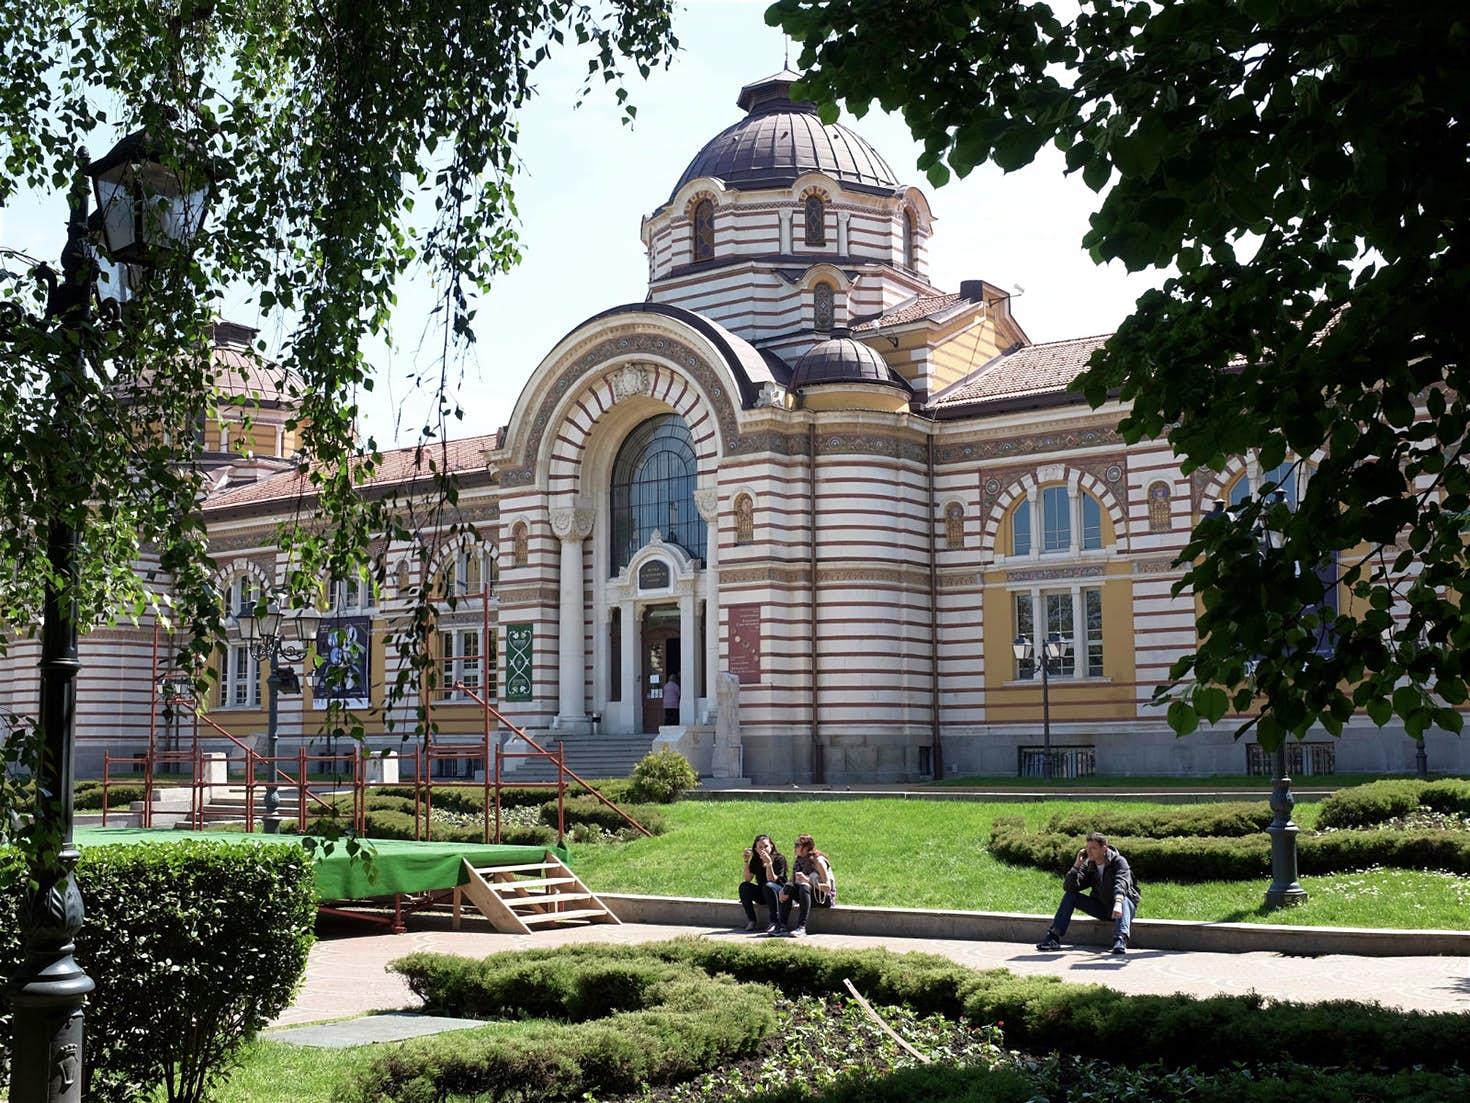 Bagni Termali Sofia : Sofia history museum sofia bulgaria attractions lonely planet